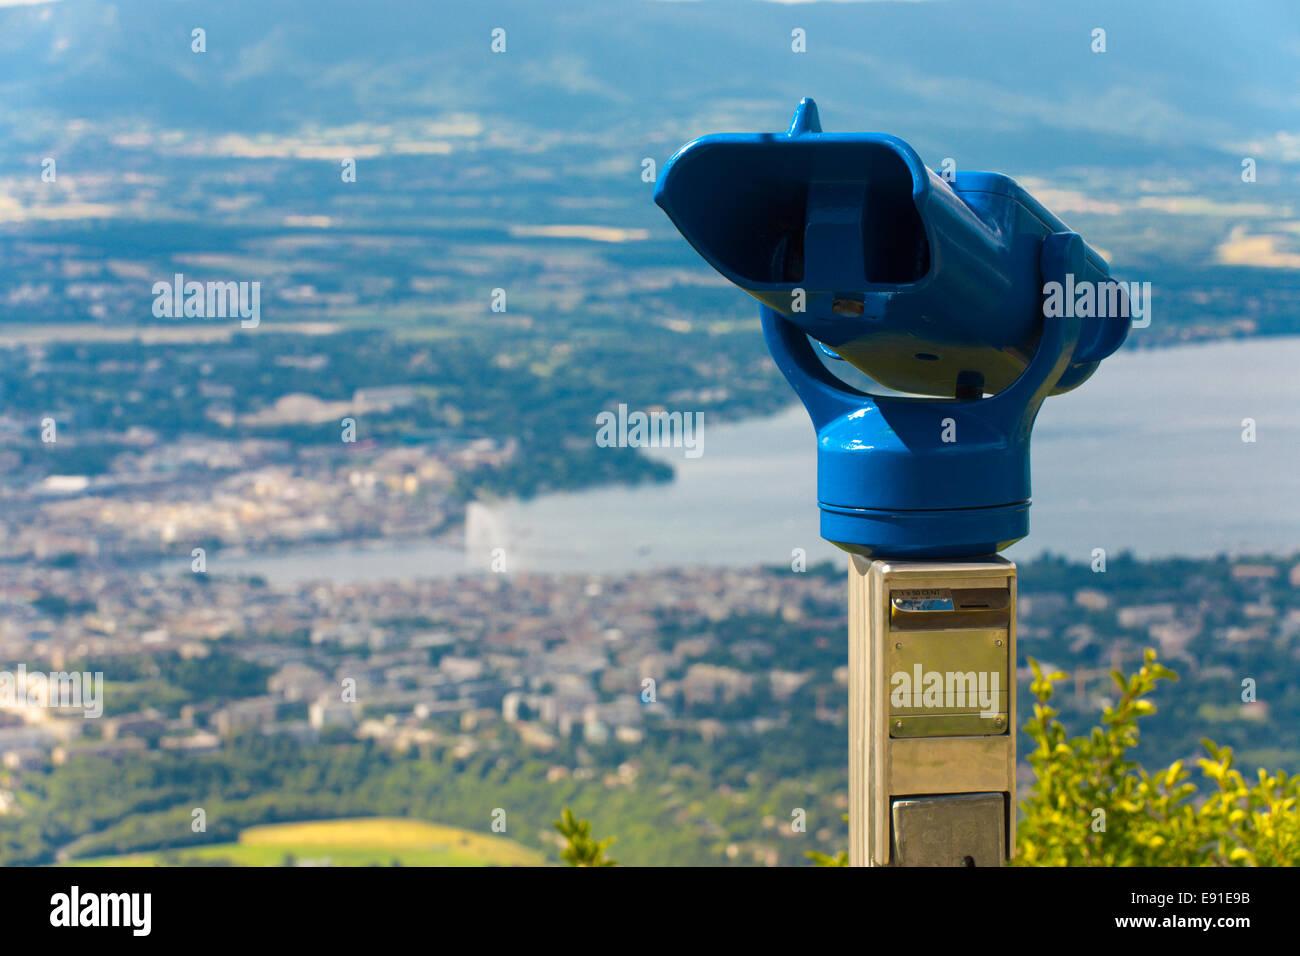 Coin Operated Binoculars Geneva - Stock Image